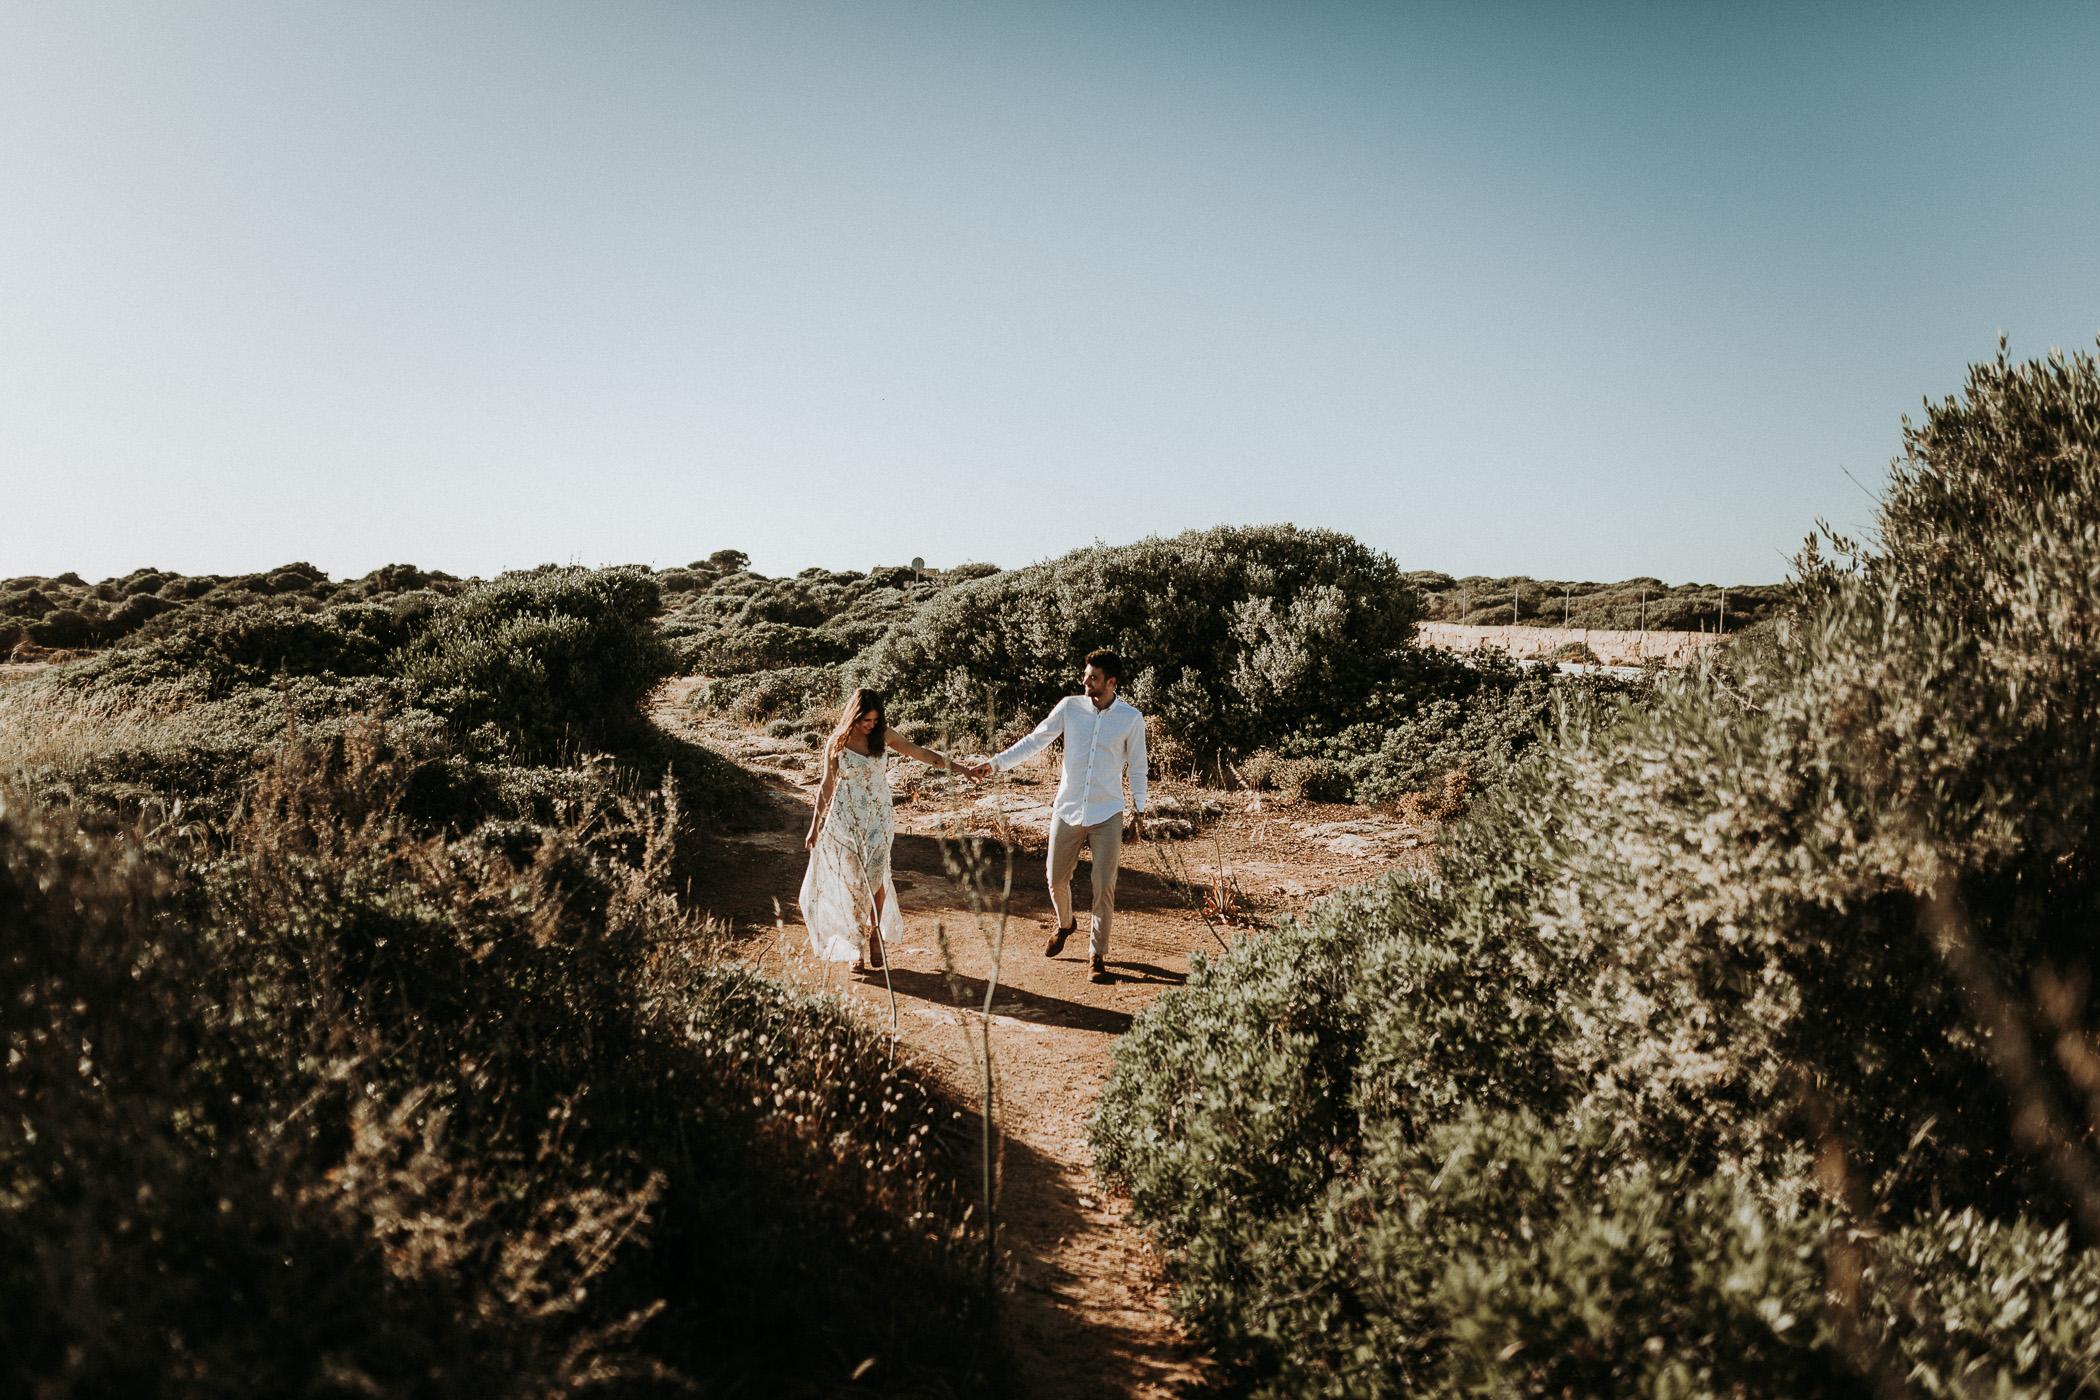 DanielaMarquardtPhotography_wedding_elopement_mallorca_spain_calapi_palma_lauraandtoni_206